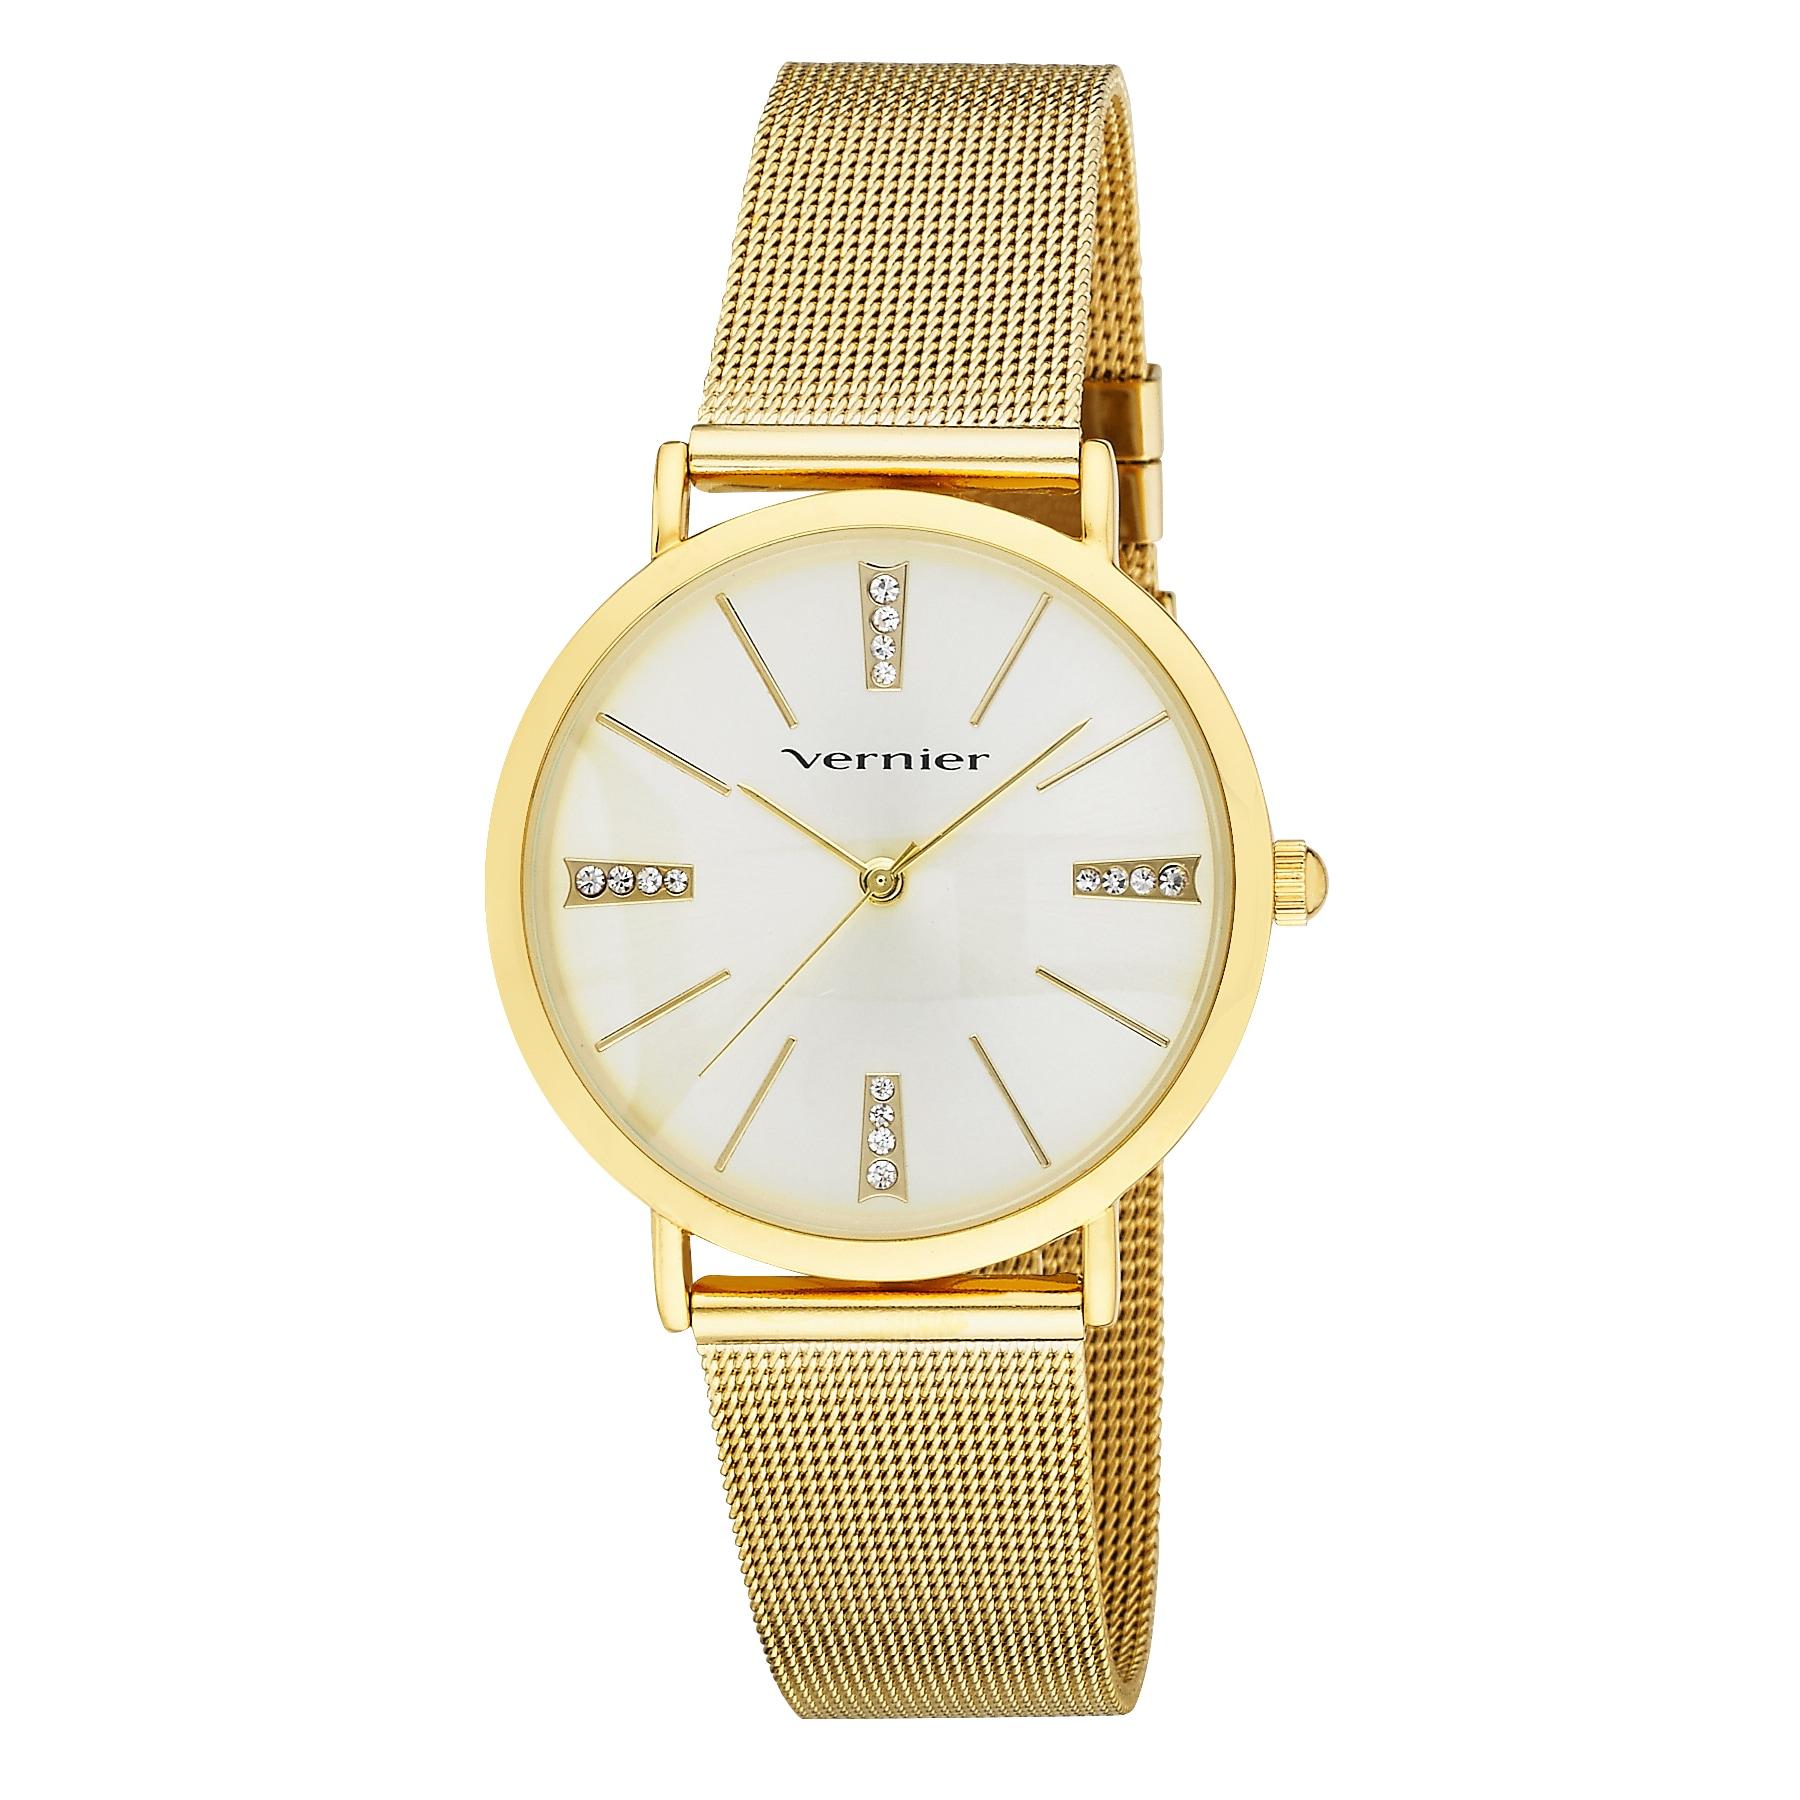 Vernier Software Women's Mesh Band Crystal Marker Watch (...